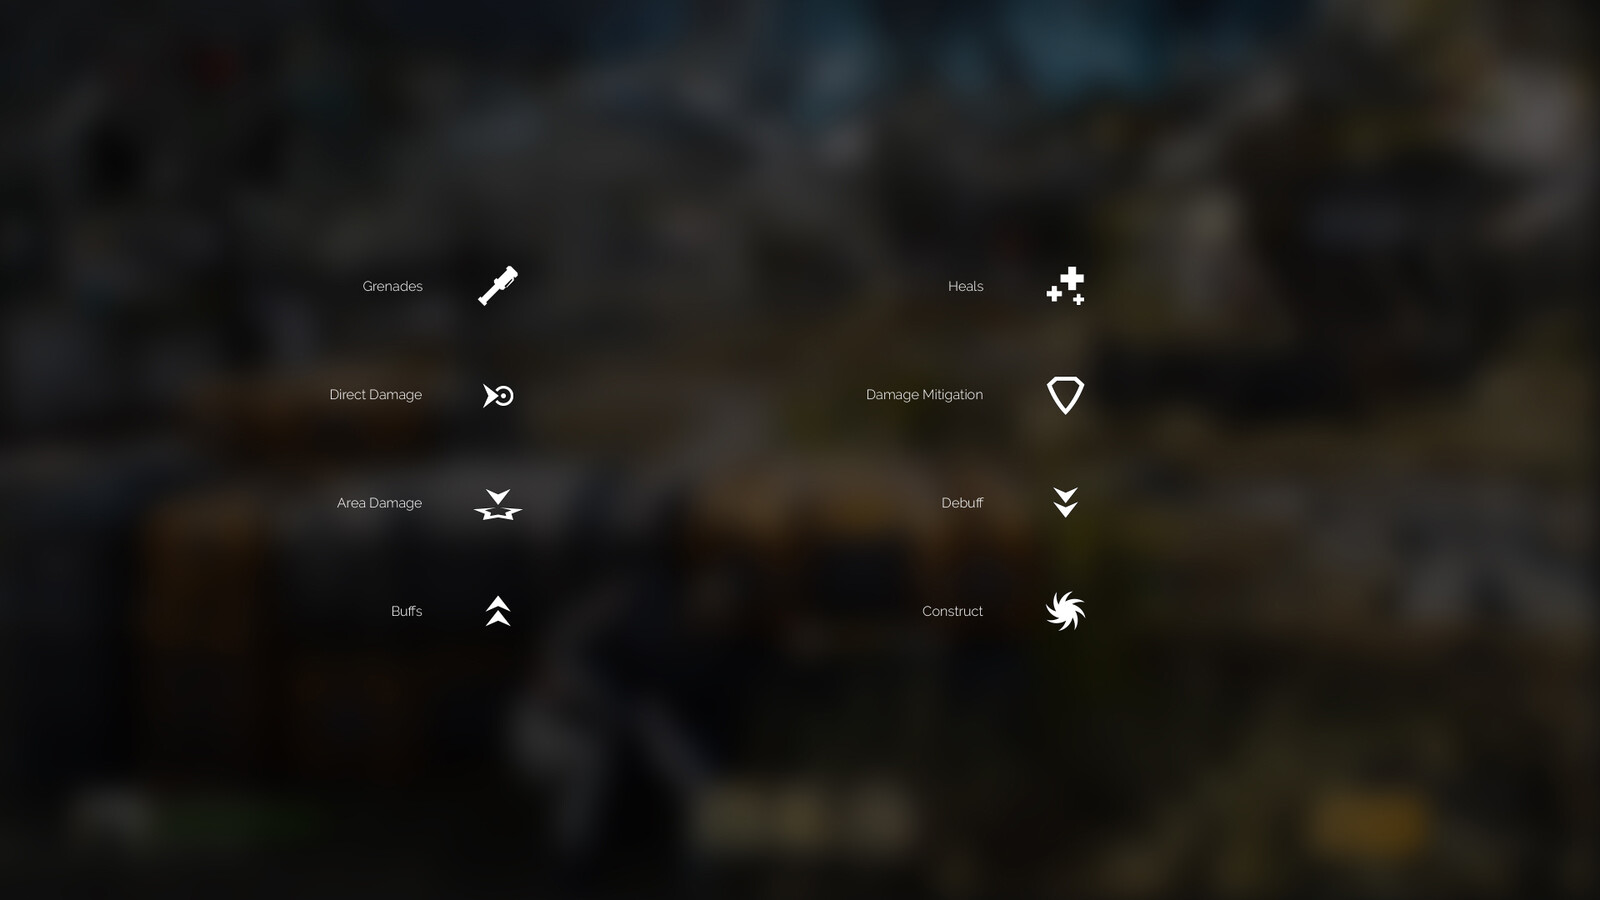 Designs for the offscreen indicators